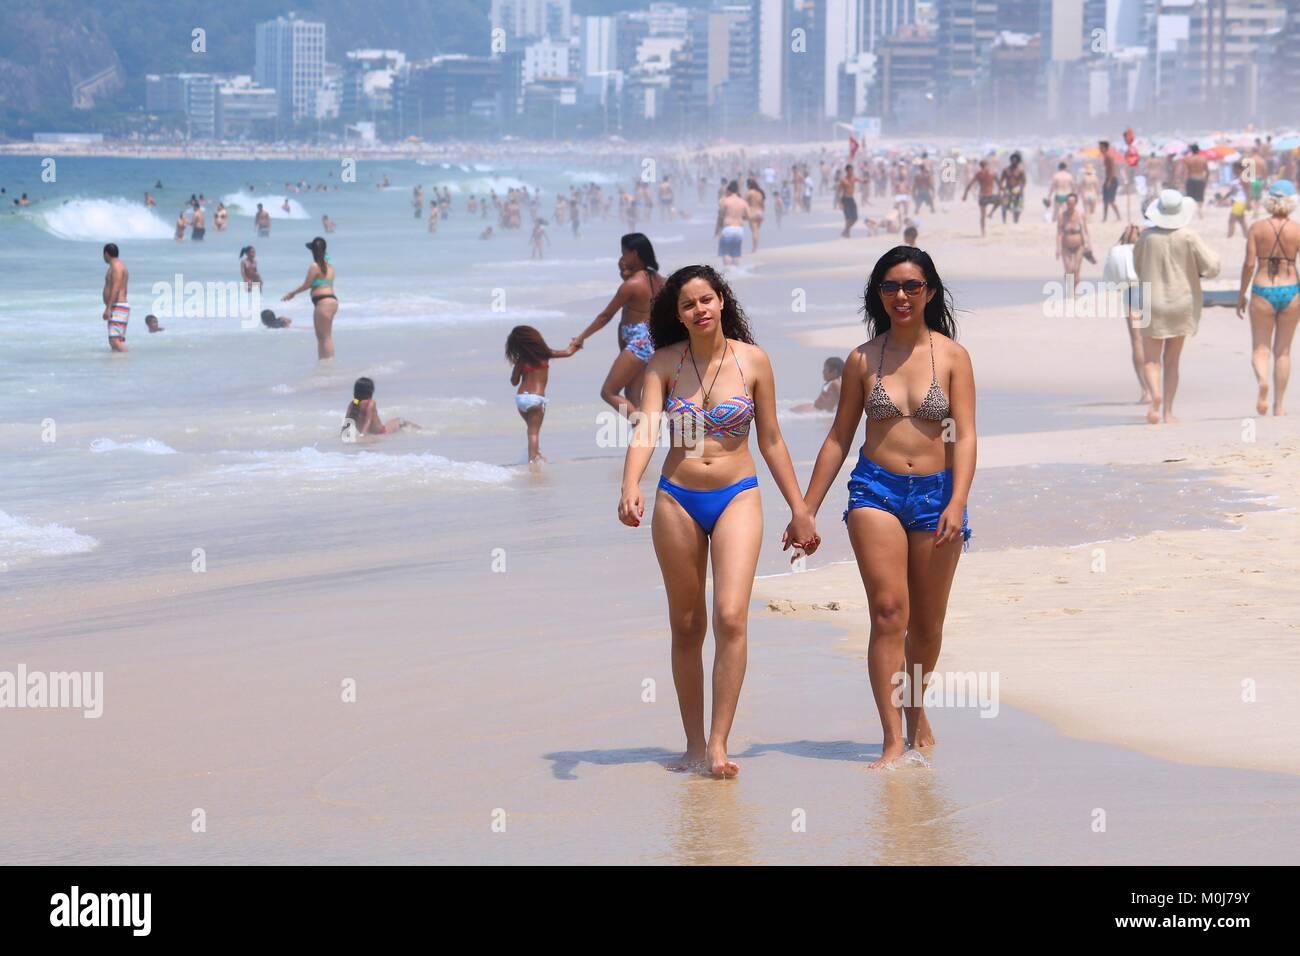 c4c47d799429 Brazil Ipanema Bikini Stock Photos & Brazil Ipanema Bikini Stock ...